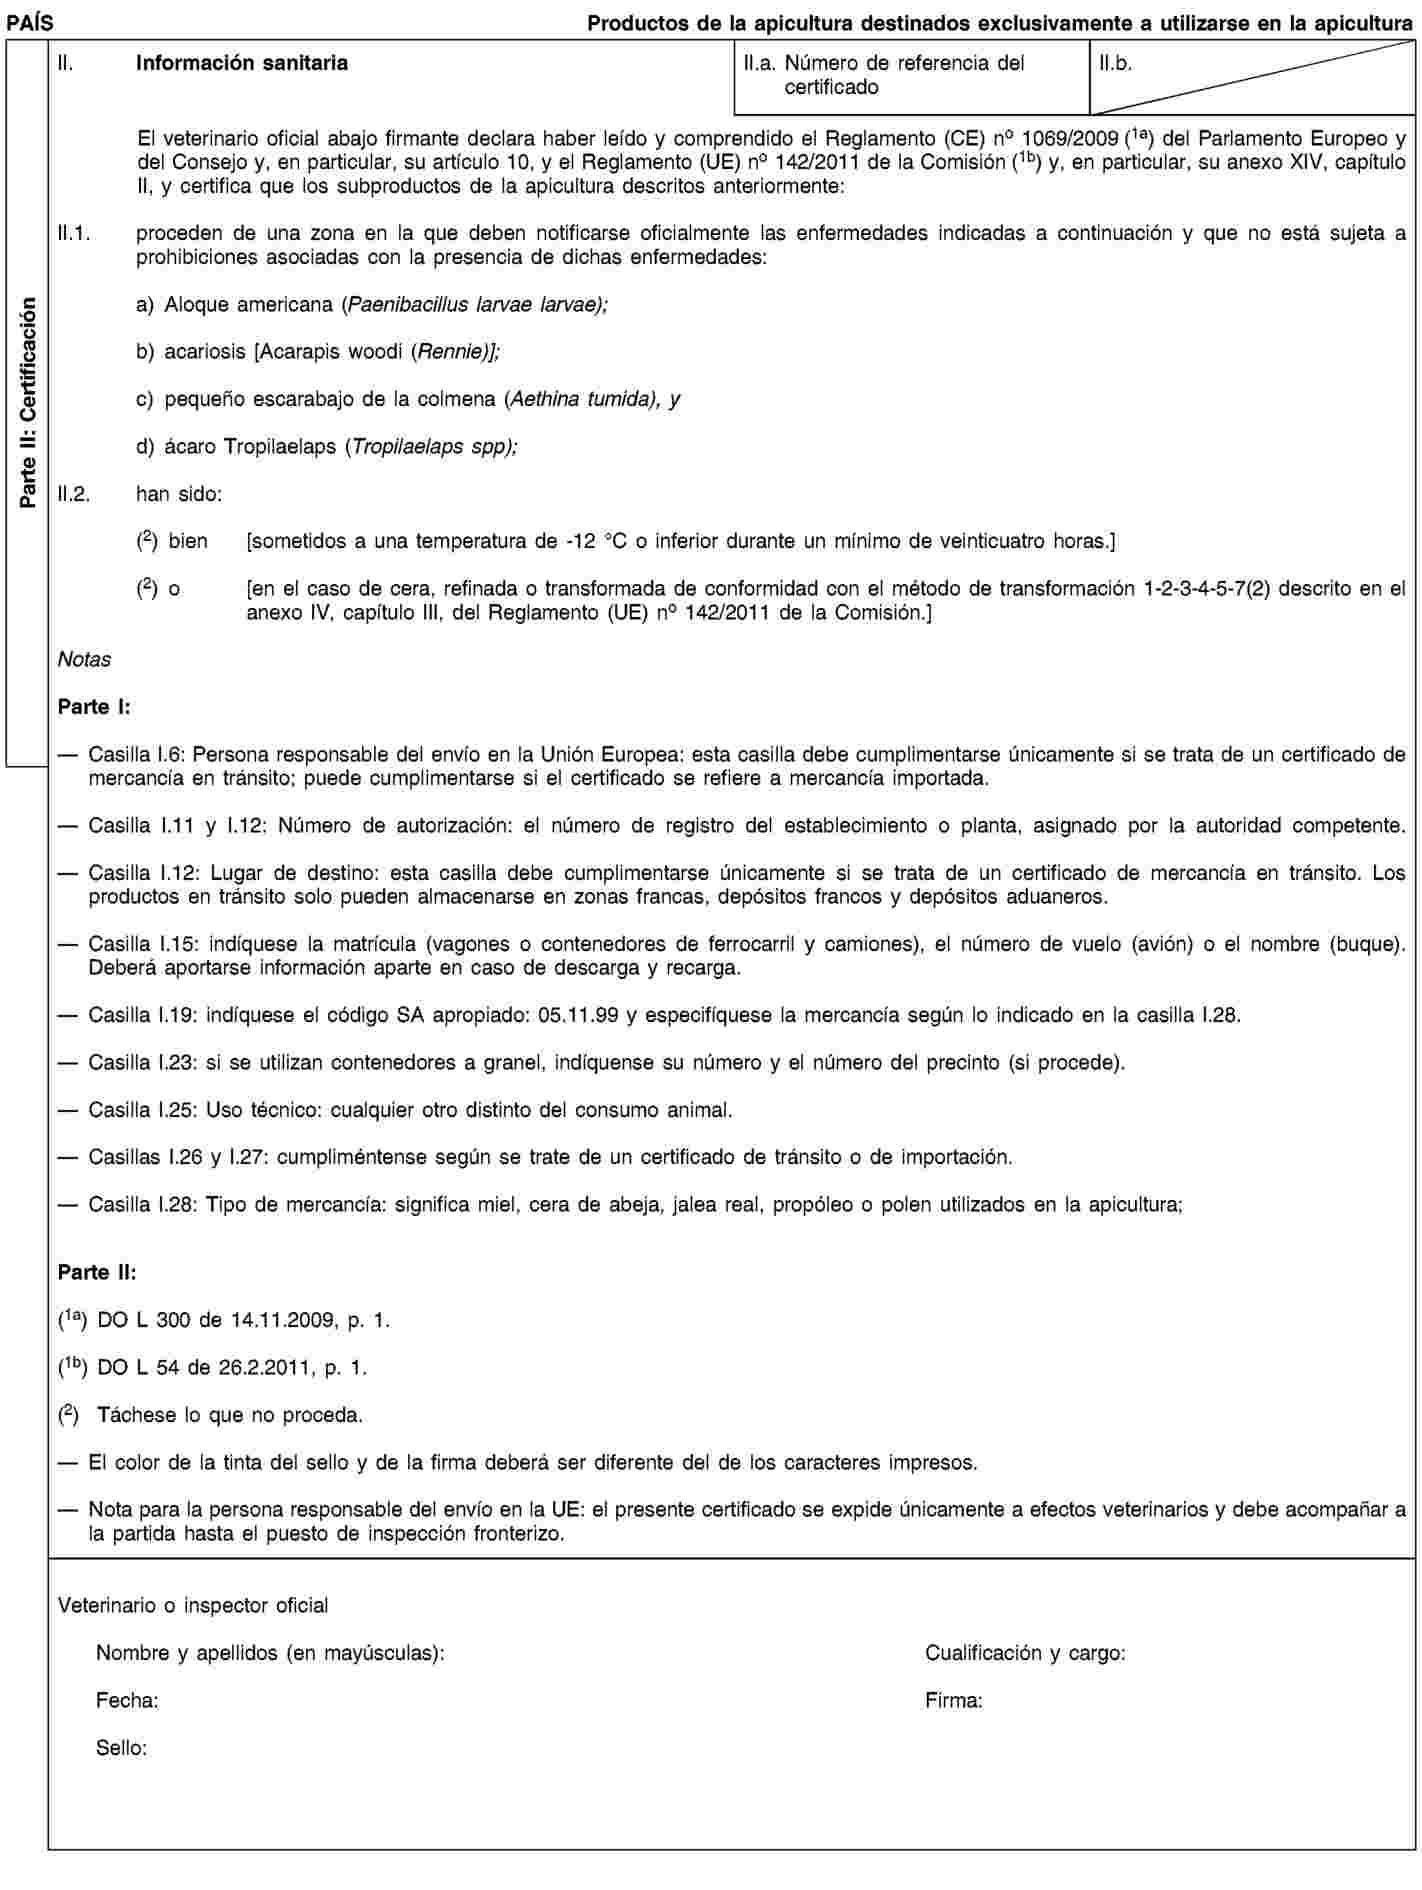 Imagen: https://eur-lex.europa.eu/resource.html?uri=uriserv:OJ.L_.2011.054.01.0001.01.SPA.xhtml.L_2011054ES.01022401.tif.jpg